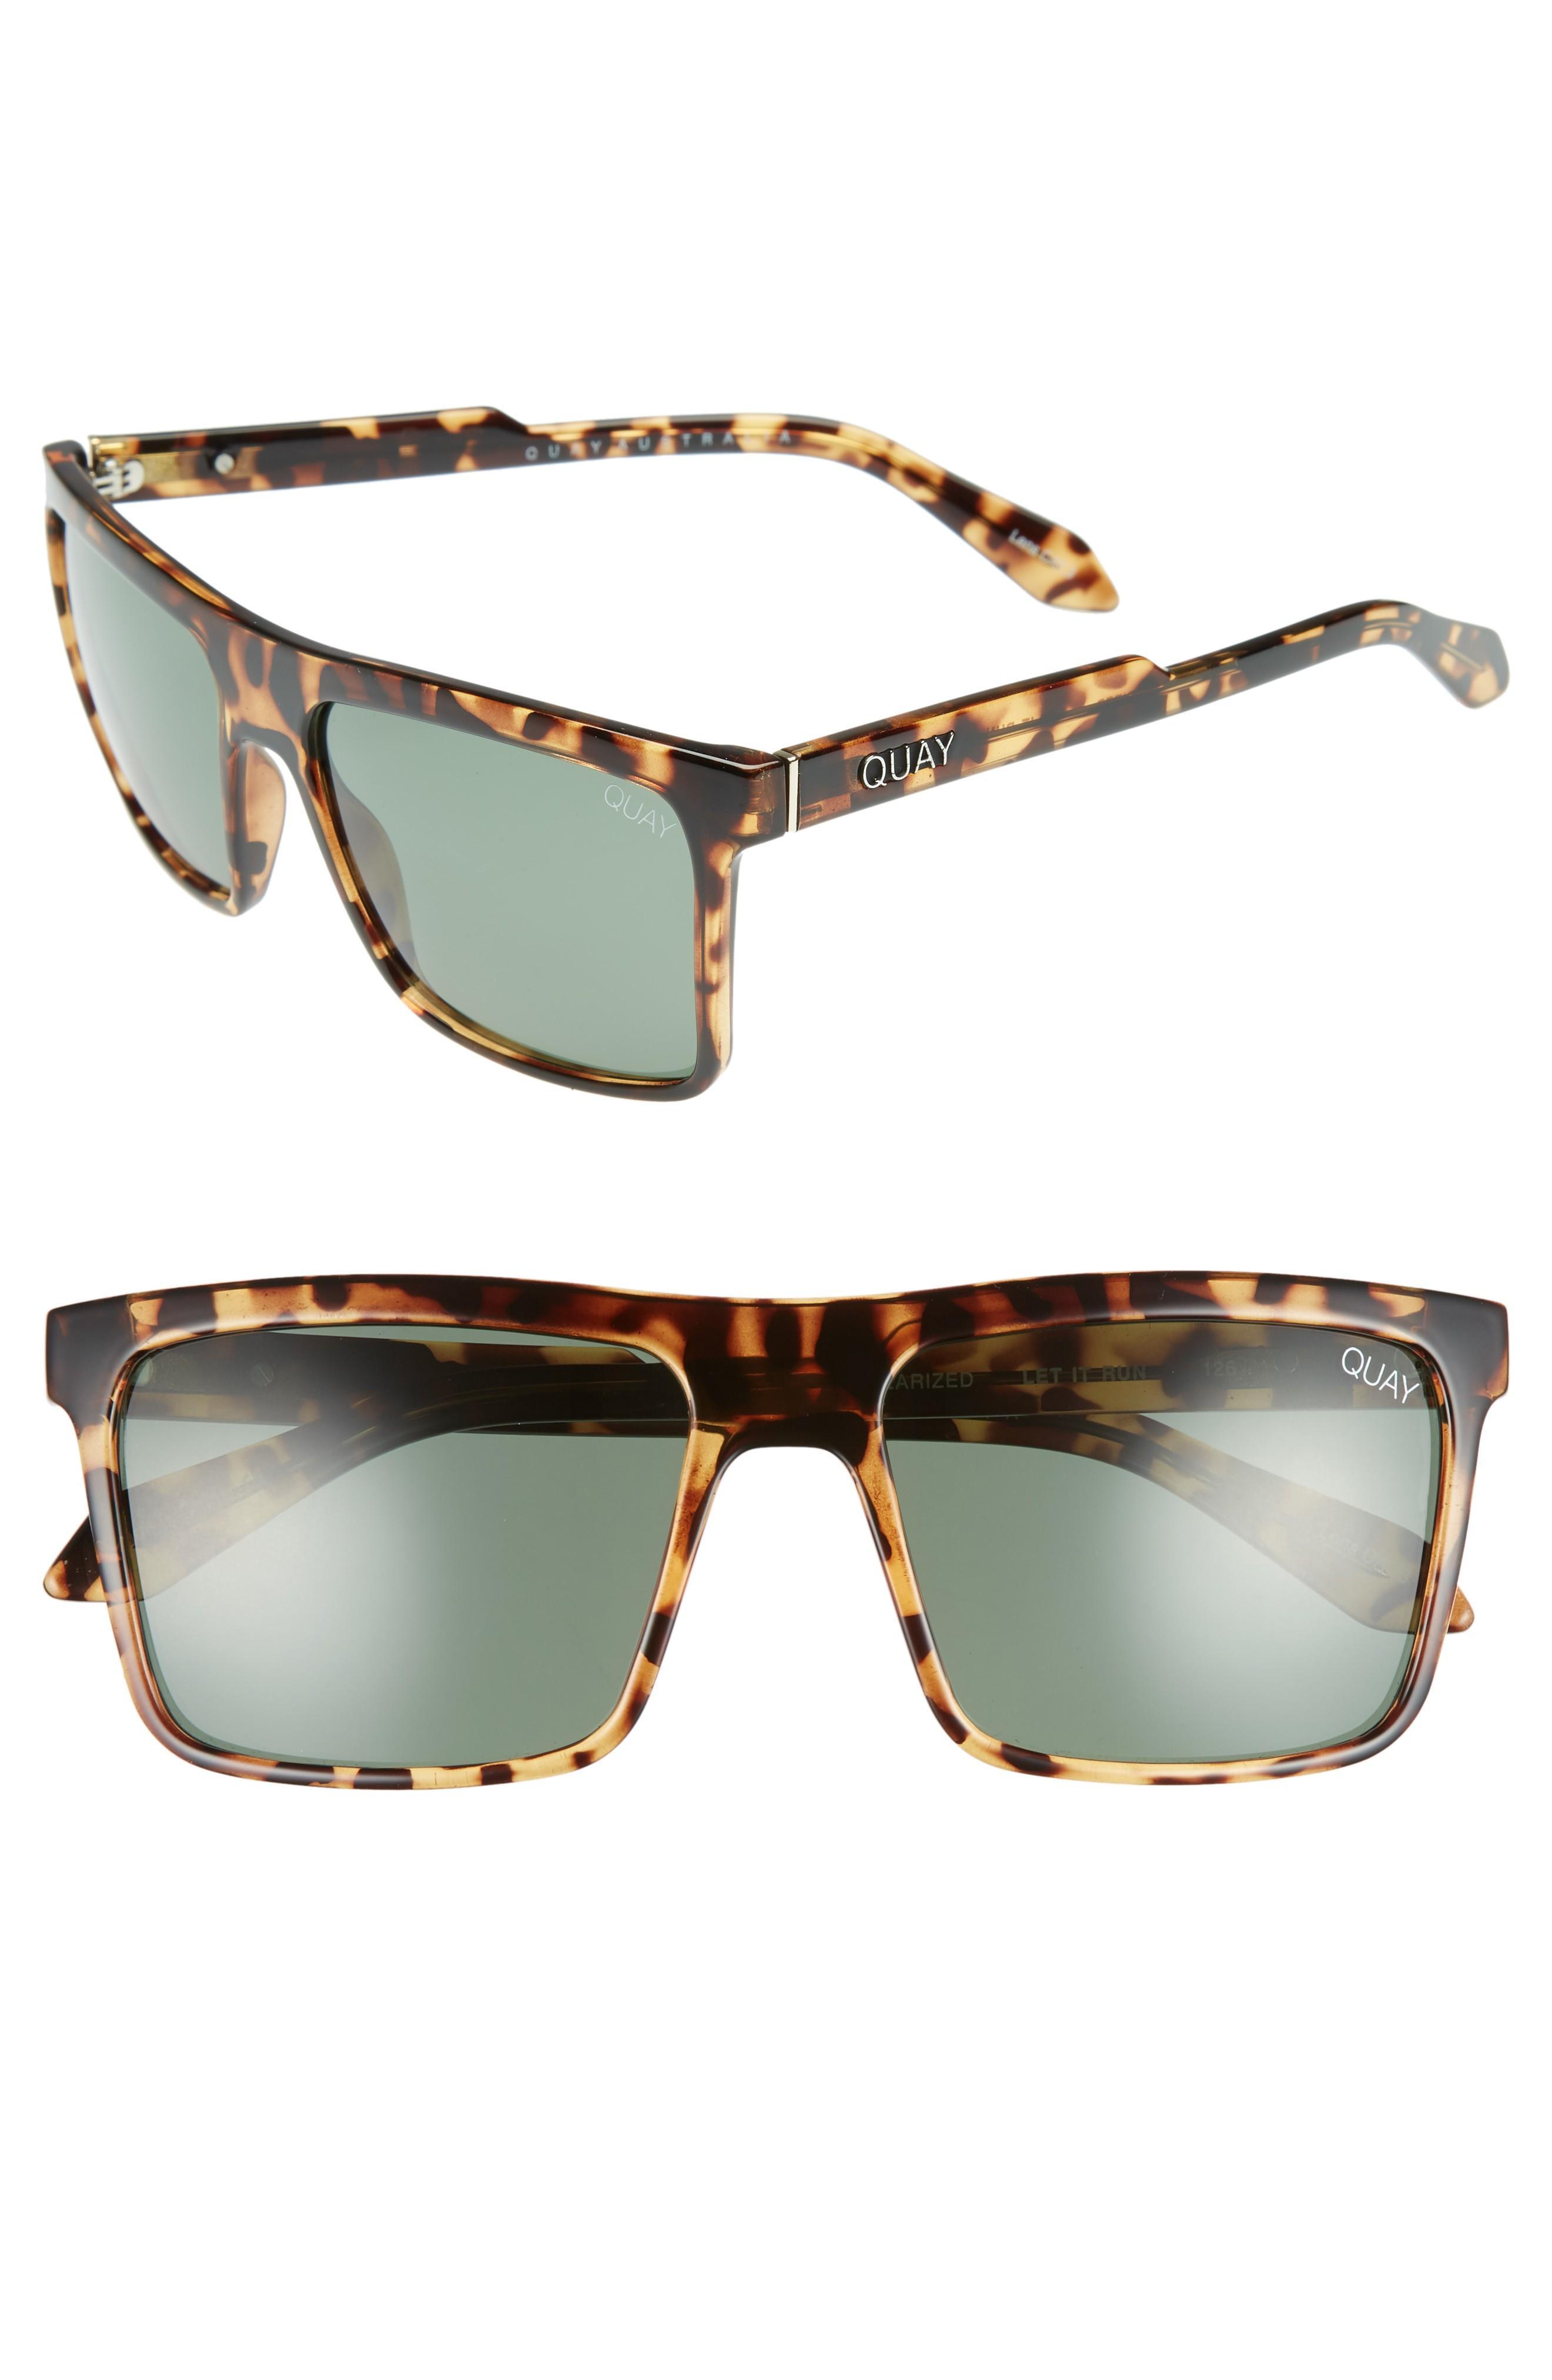 58fc8291ad02f Quay Let It Run 57Mm Polarized Sunglasses In Tort   Green Lens ...